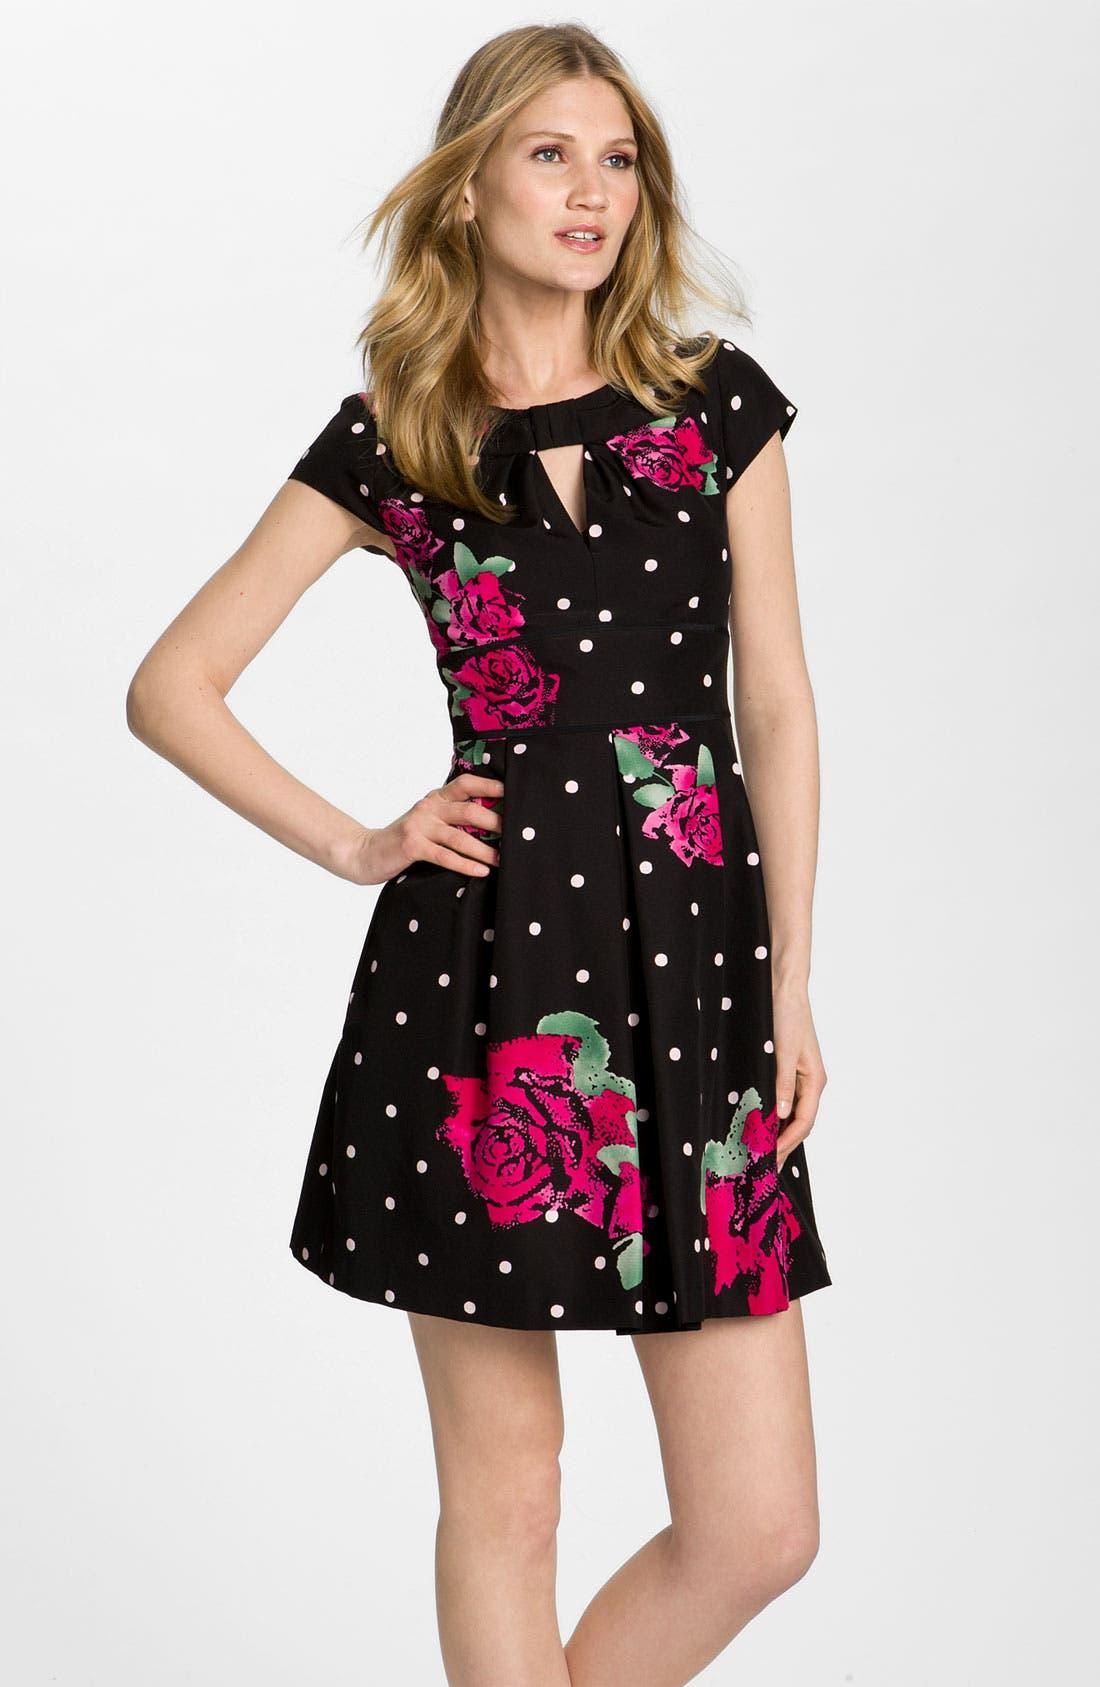 Alternate Image 1 Selected - Nanette Lepore 'Bouquet' Print Dress